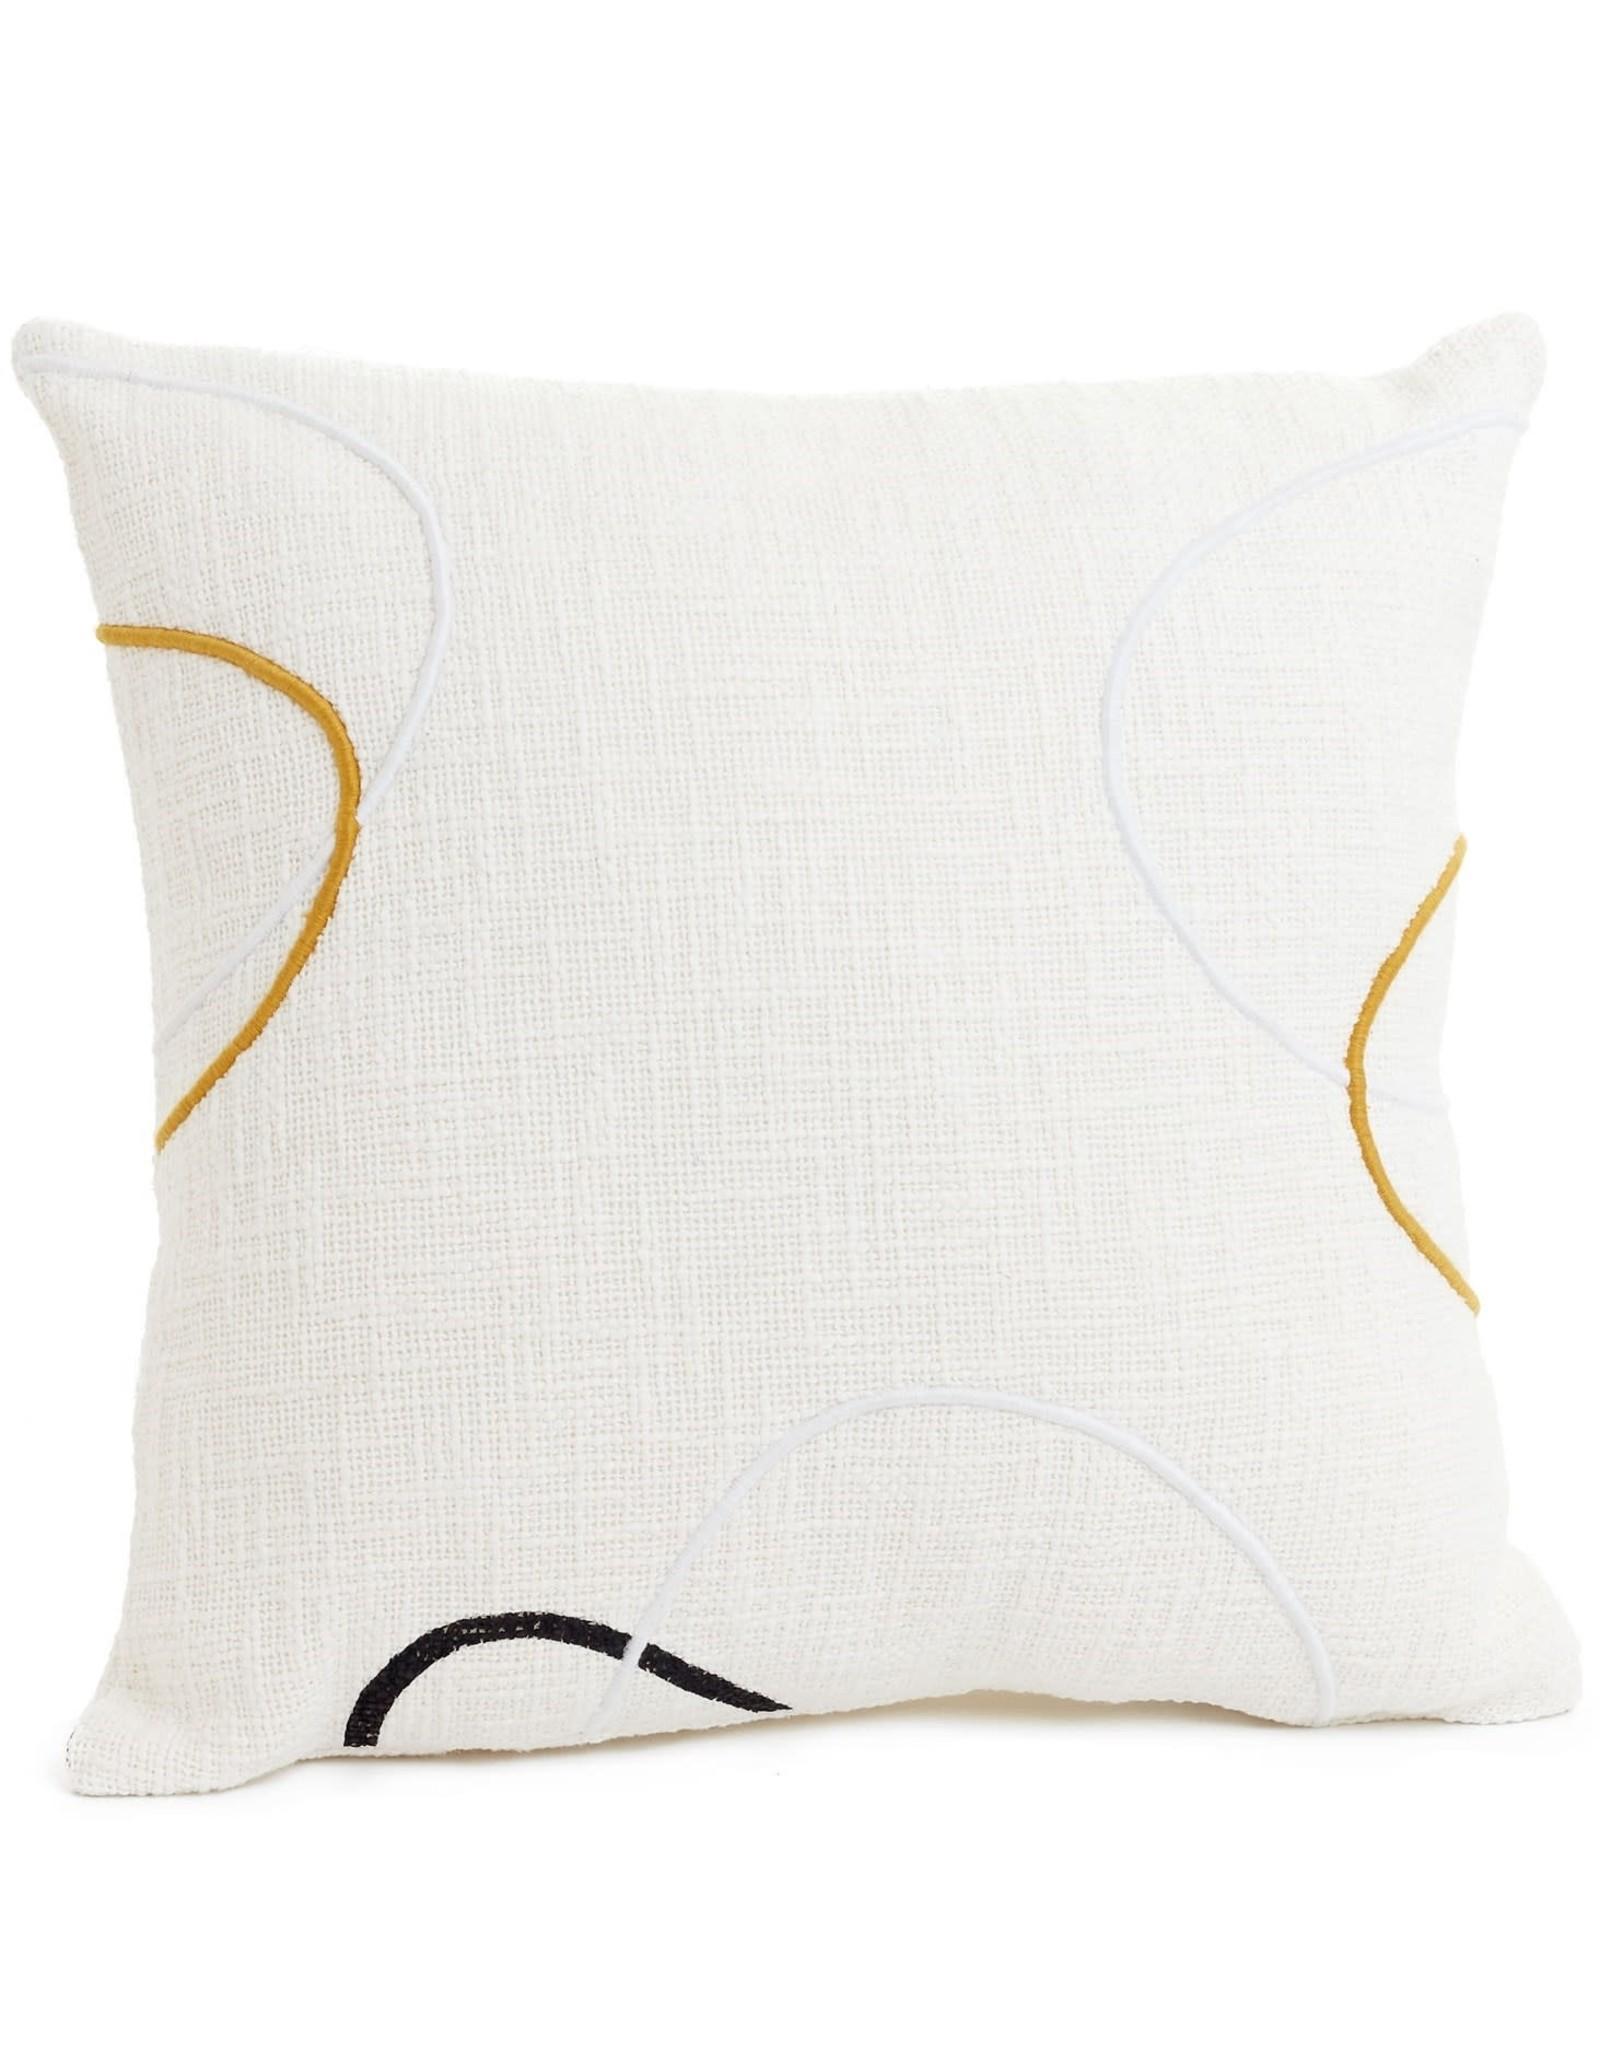 Bonavista - Bovi Home Embroidered Cushion - Ecru/Saffron/Black